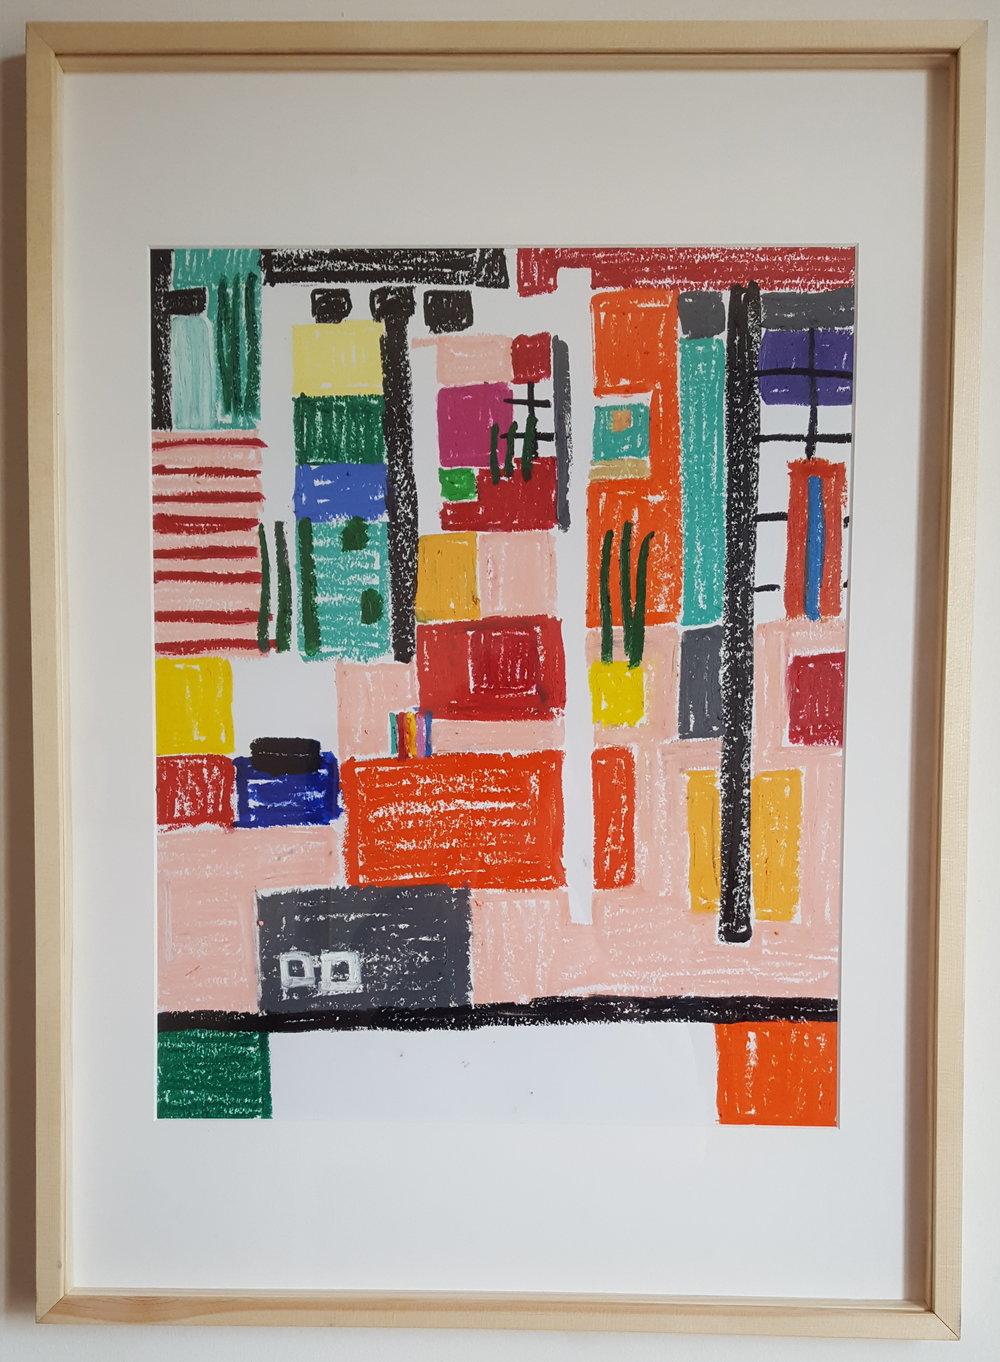 """Schématisation salon Arp""  - Oil Pastel on paper - 50 x 65 cm - wood framed - 2019"